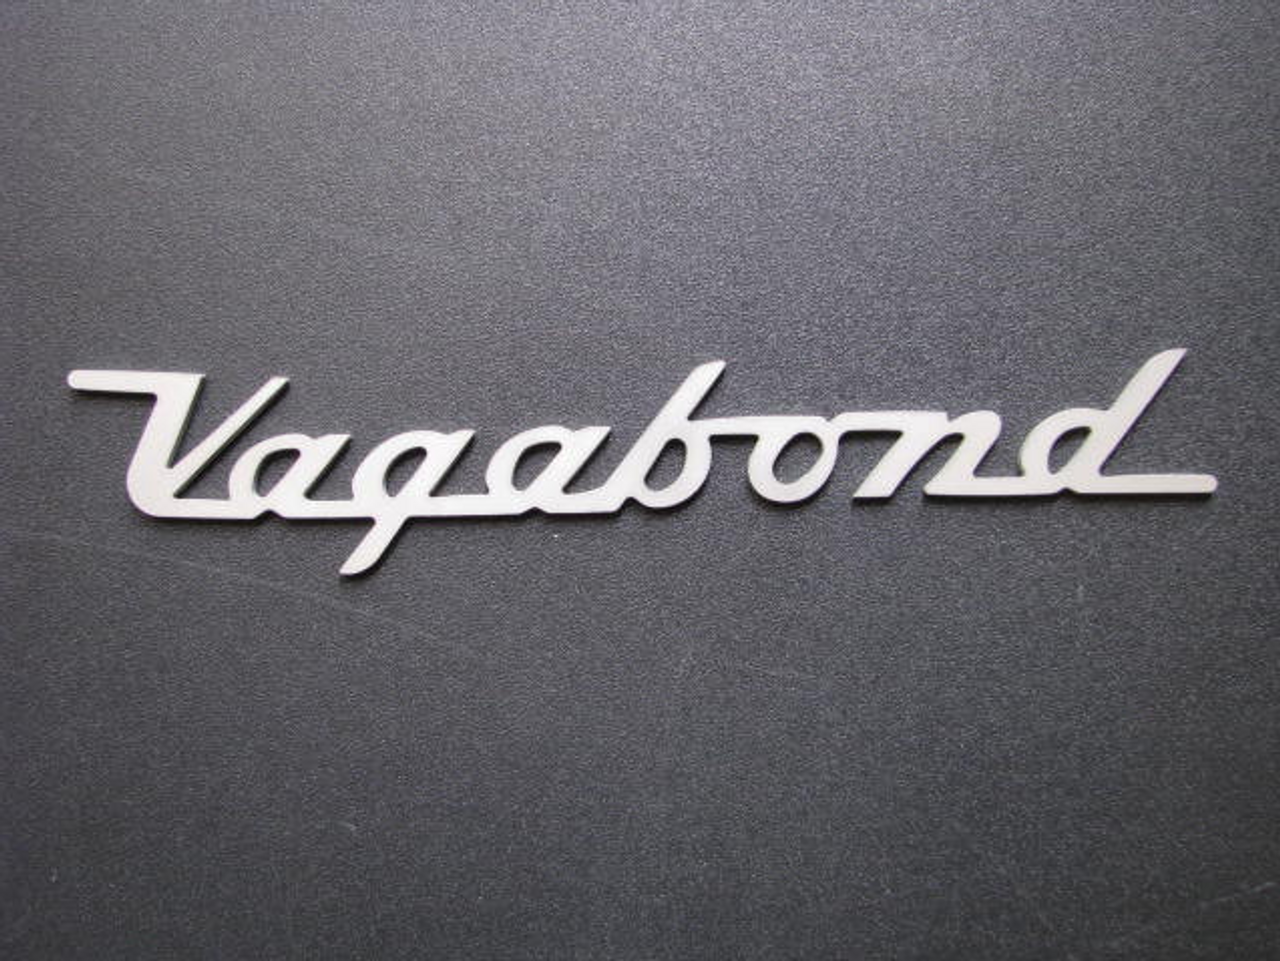 """Vagabond"" Script Nameplate (CHW131) FRONT VIEW"